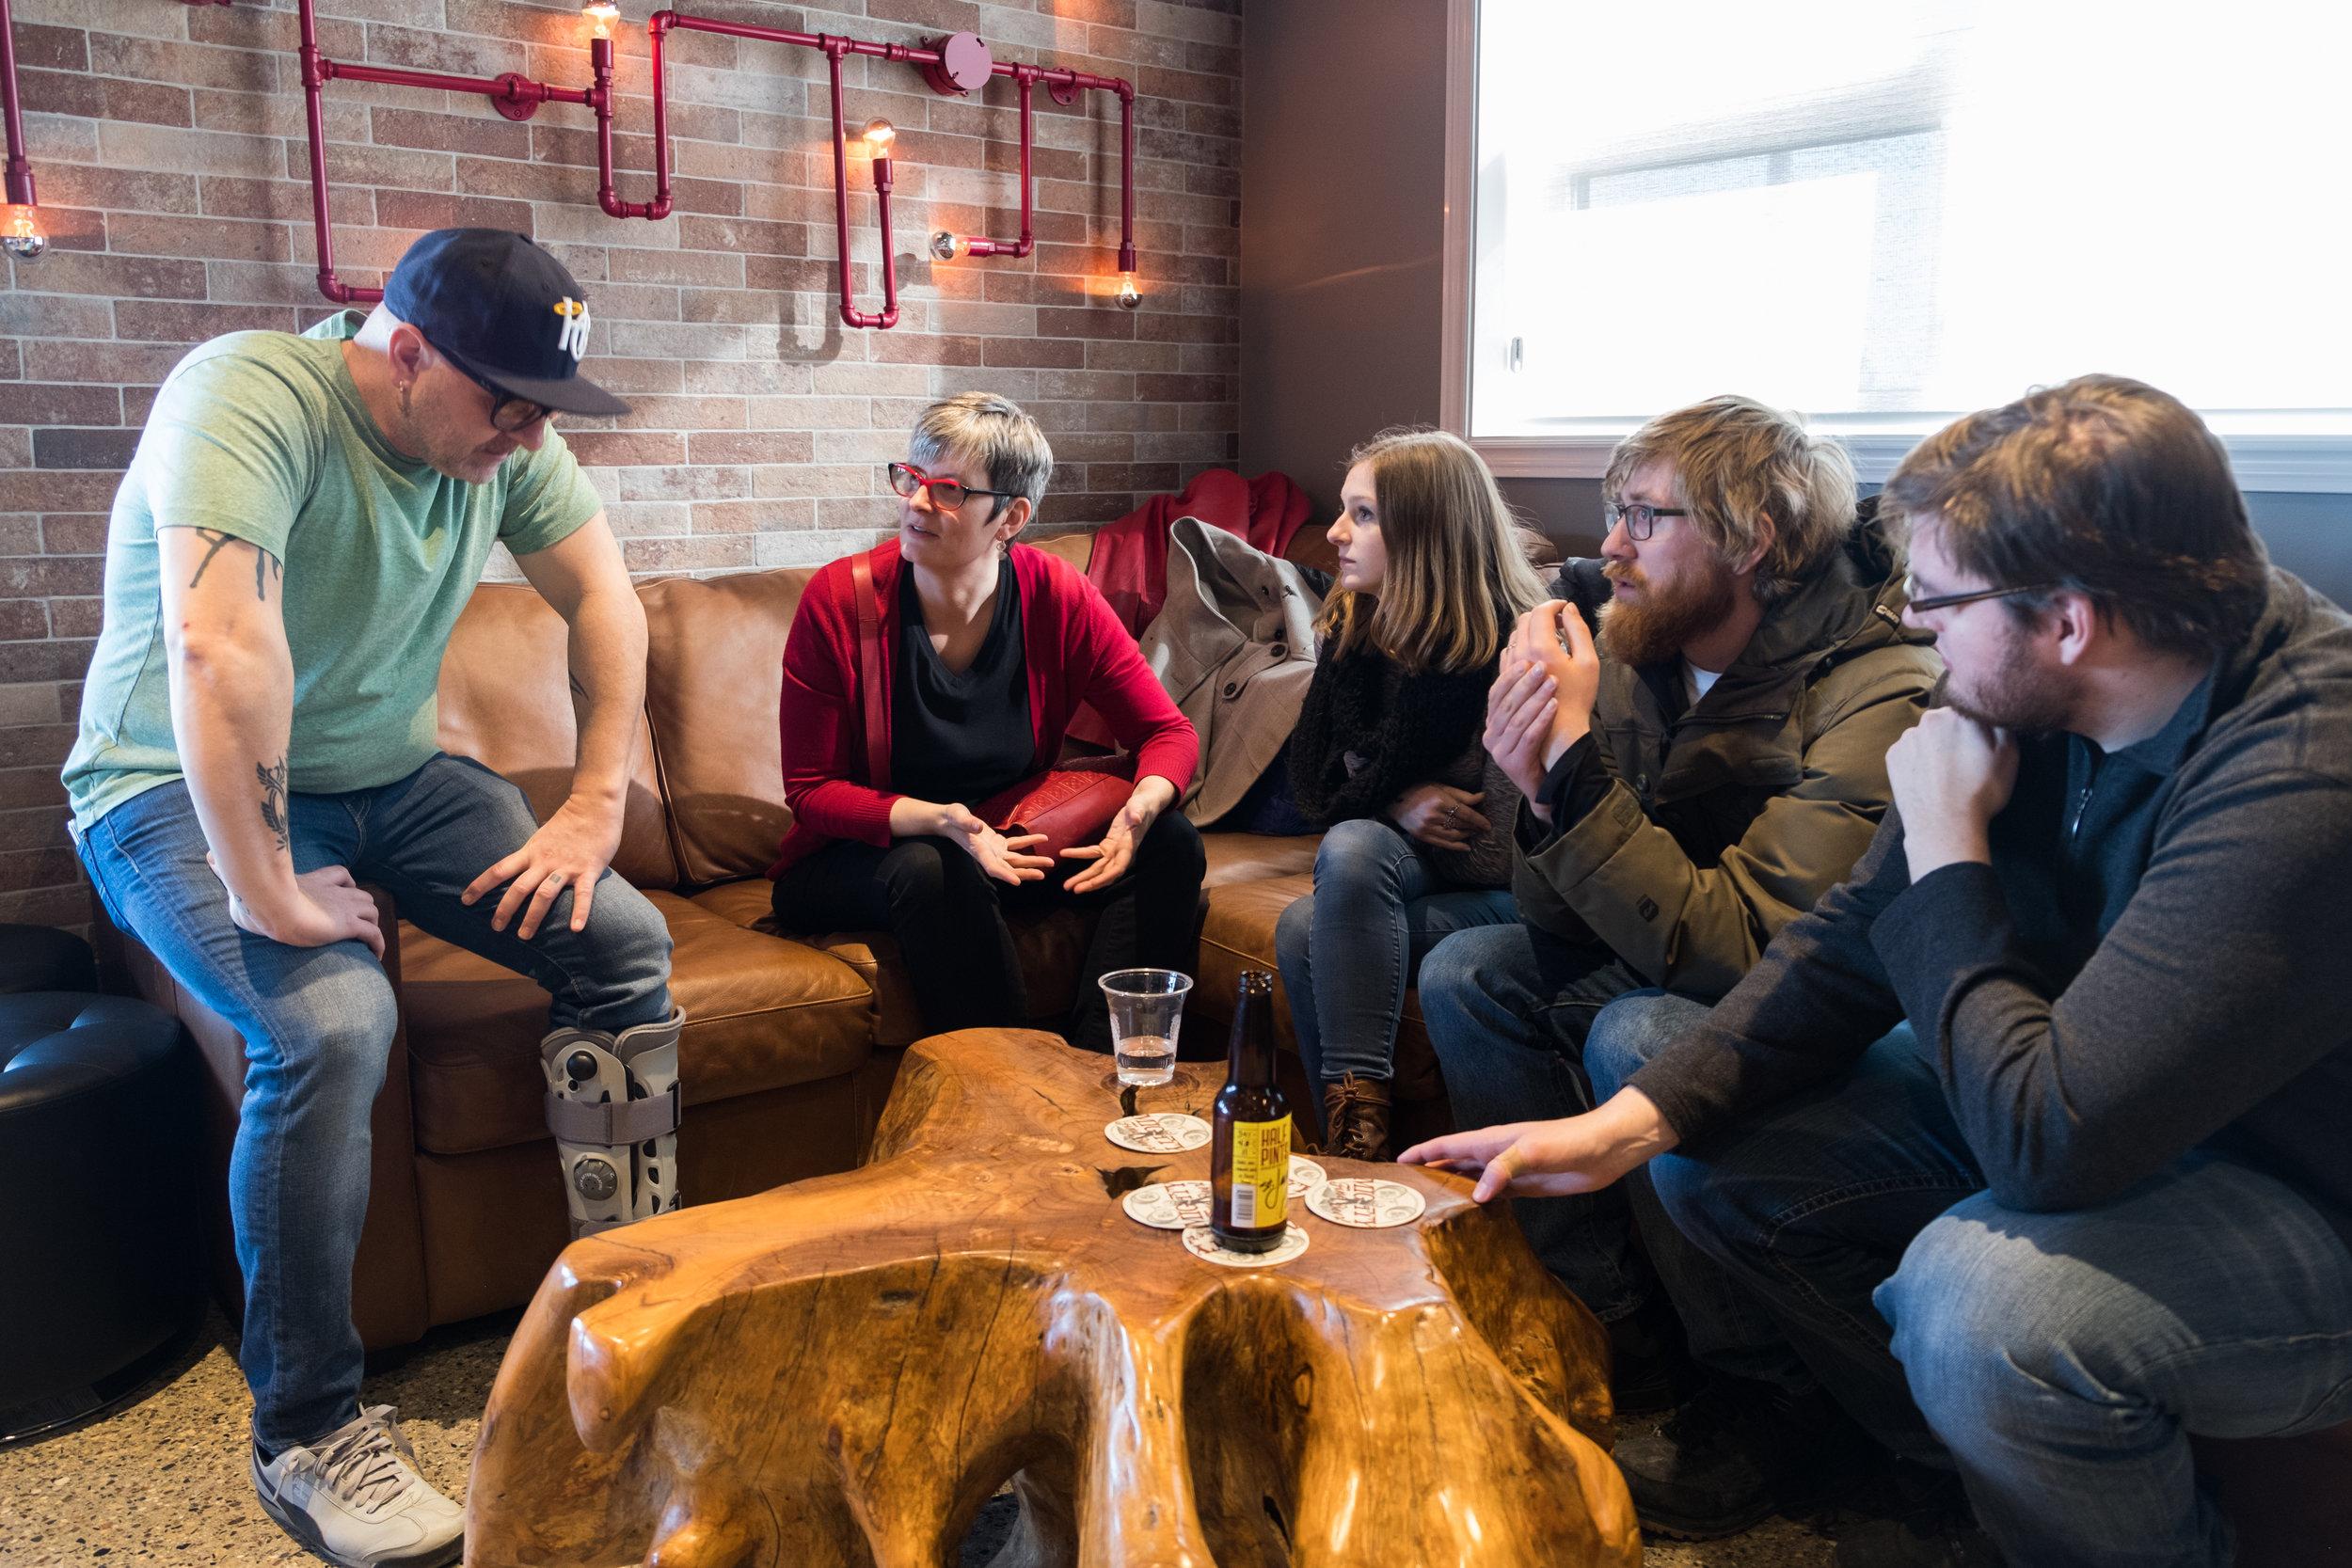 Open House - THURSDAY, 5 APRIL 2018University of Winnipeg, Bryce Hall, room 2B23